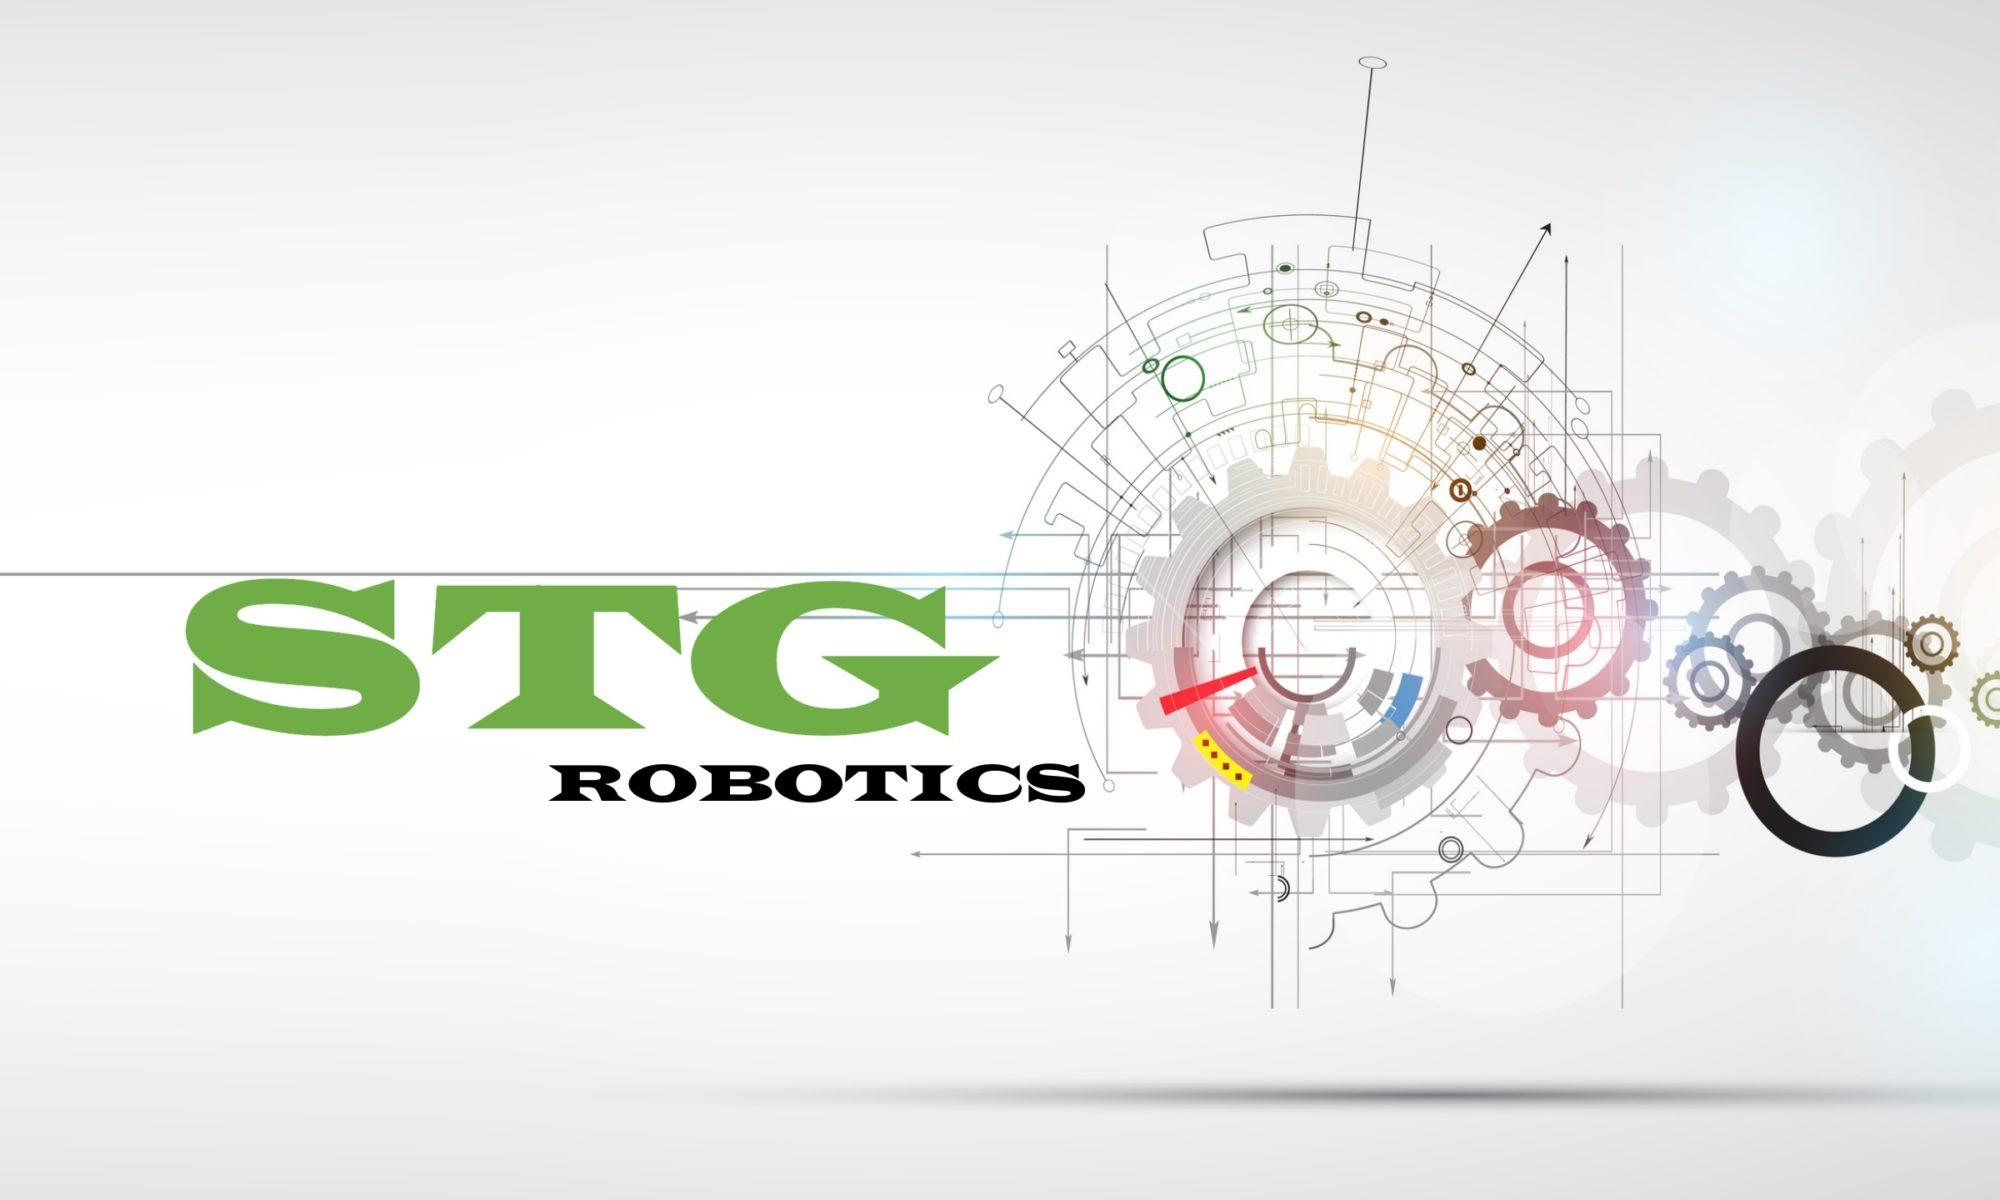 STG ROBOTICS